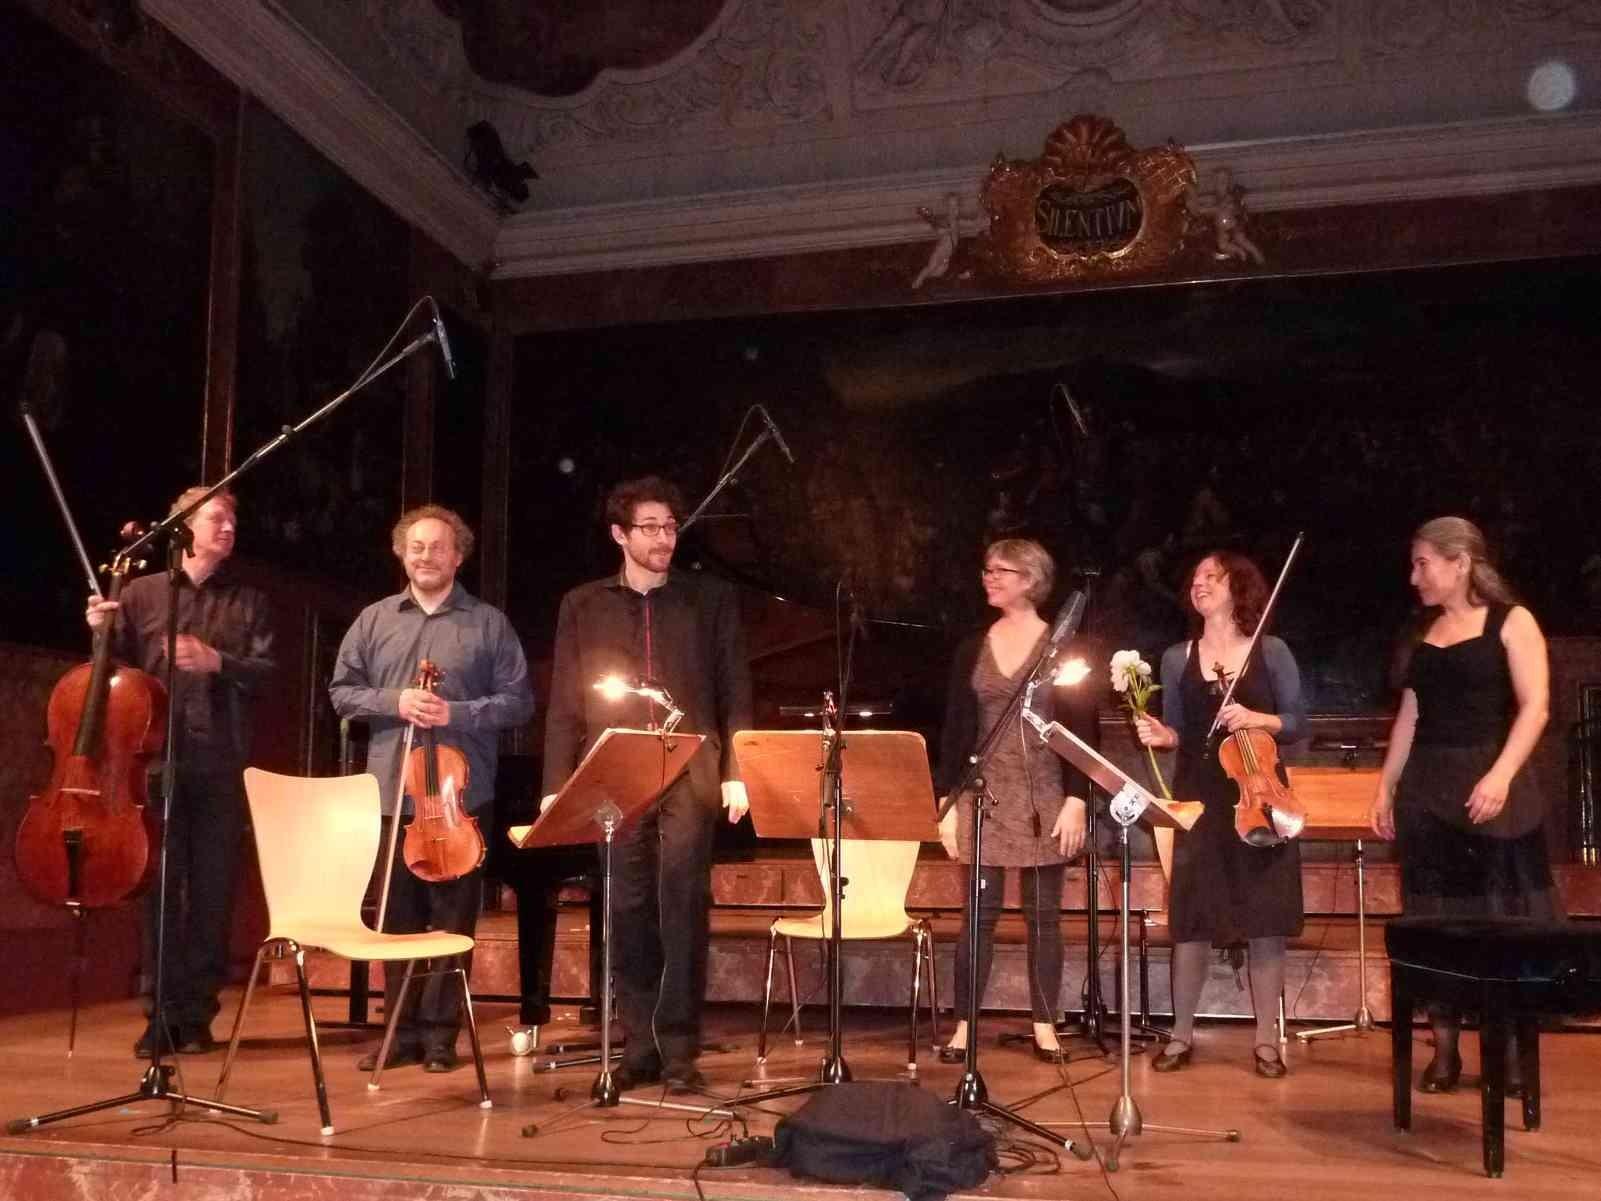 Andreas Lindenbaum, Dimitrios Polisoidis, Olivier Vivares, Annette Bik, Sophie Schafleitner, Janna Polyzoides